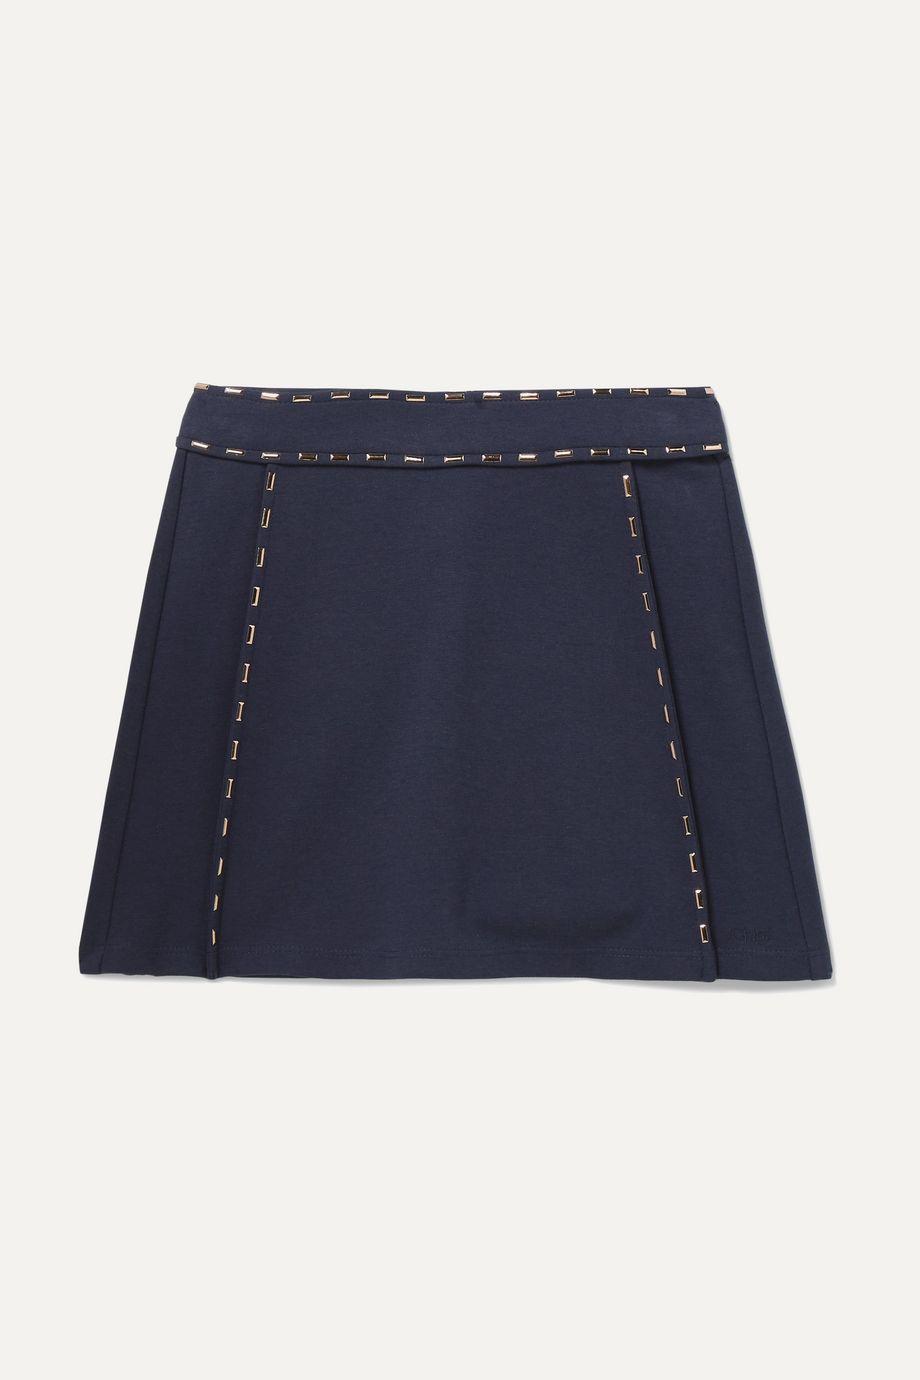 Chloé Kids Ages 6 - 12 embellished stretch-jersey skirt